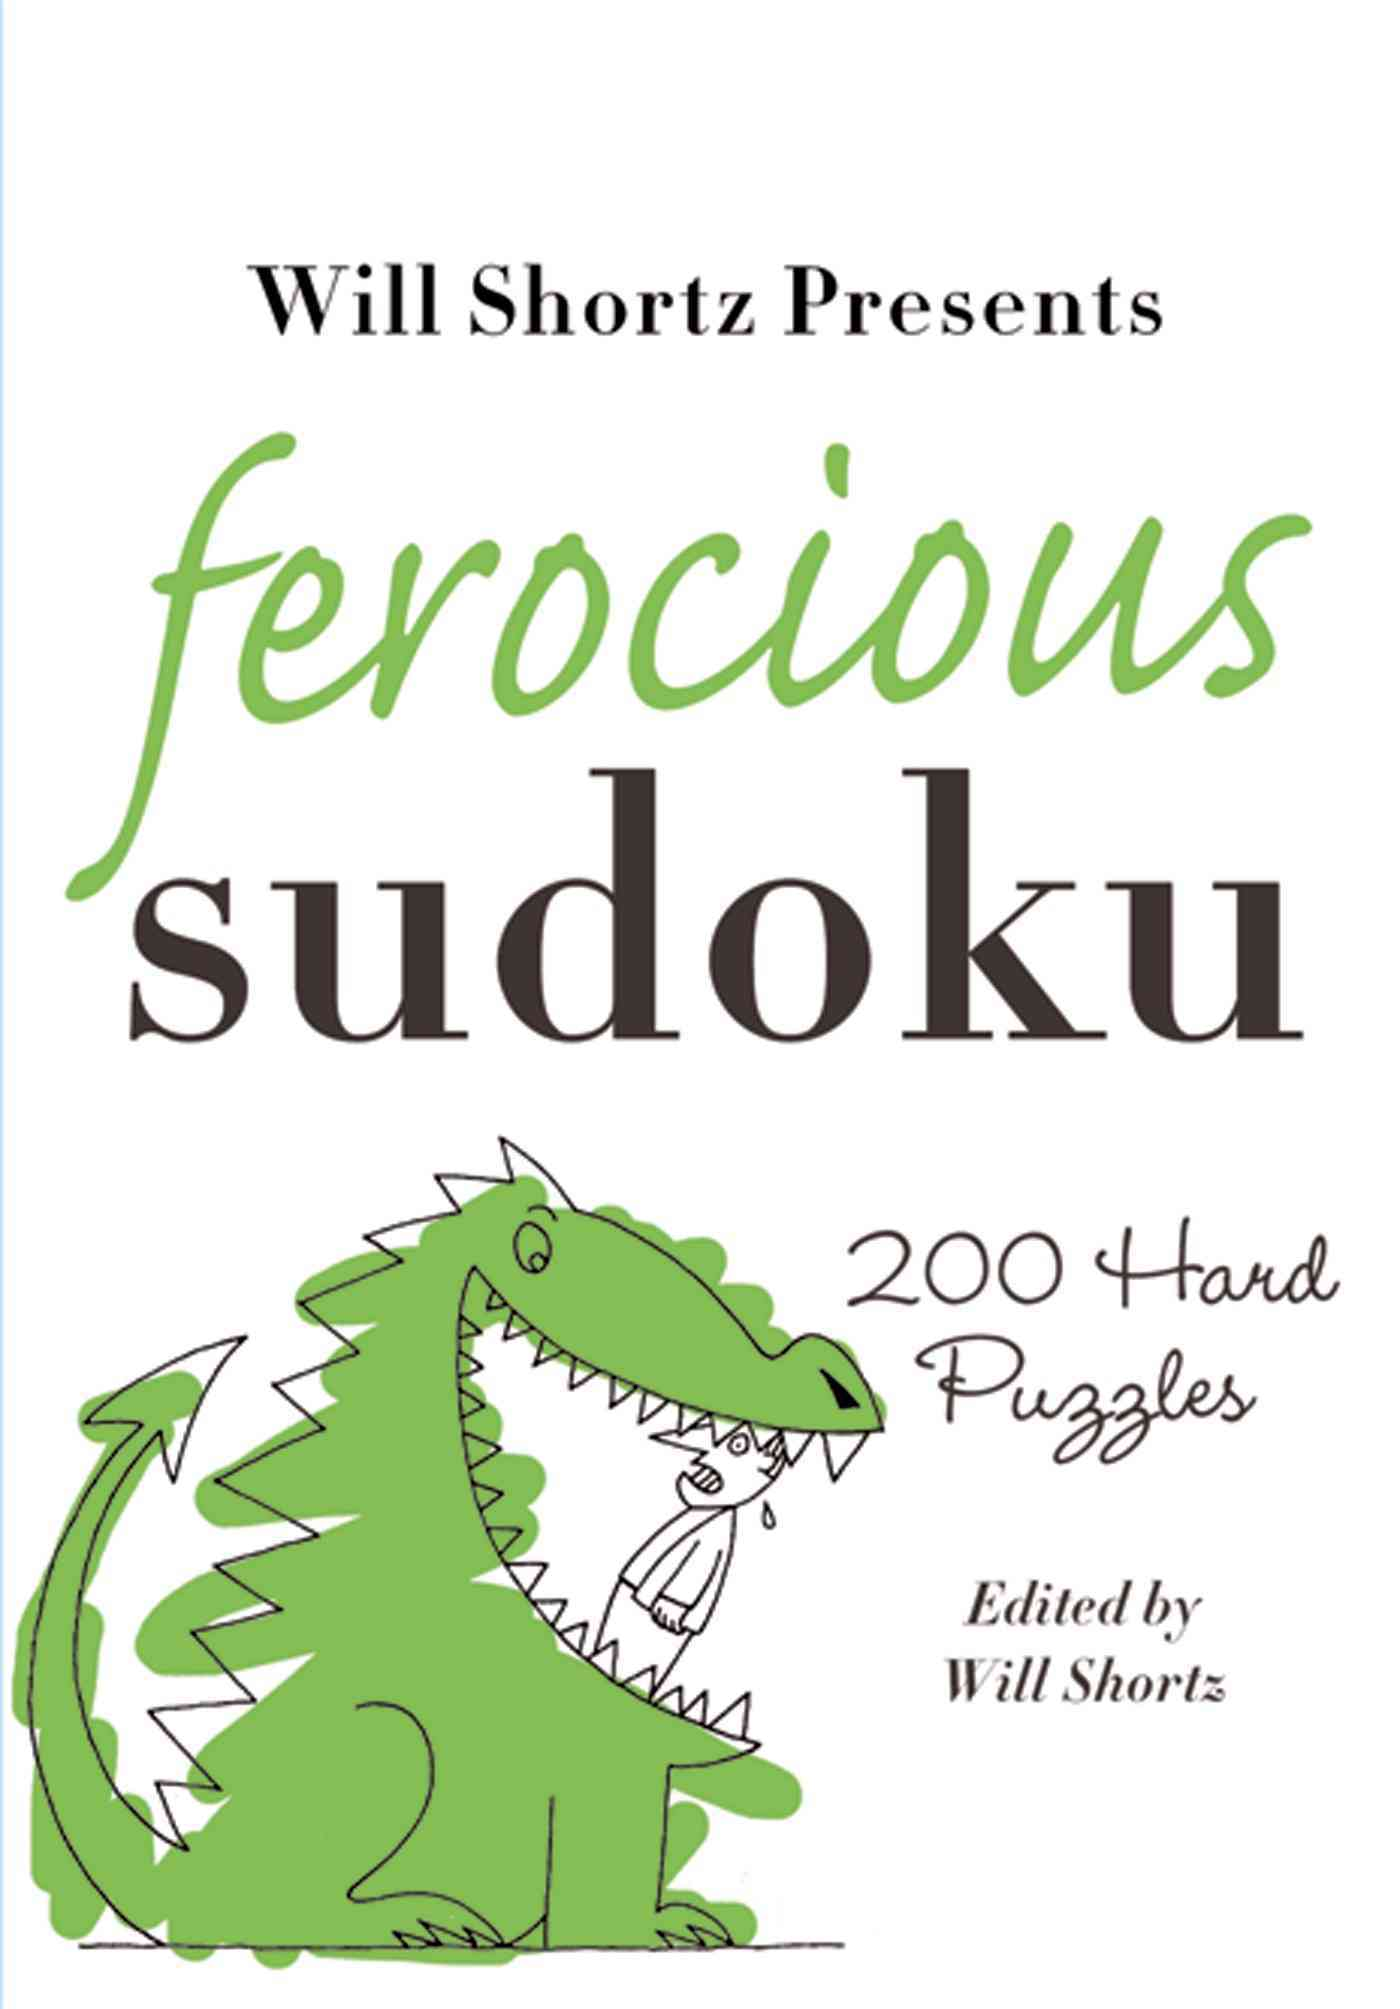 Will Shortz Presents Ferocious Sudoku: 200 Hard Puzzles (Paperback)